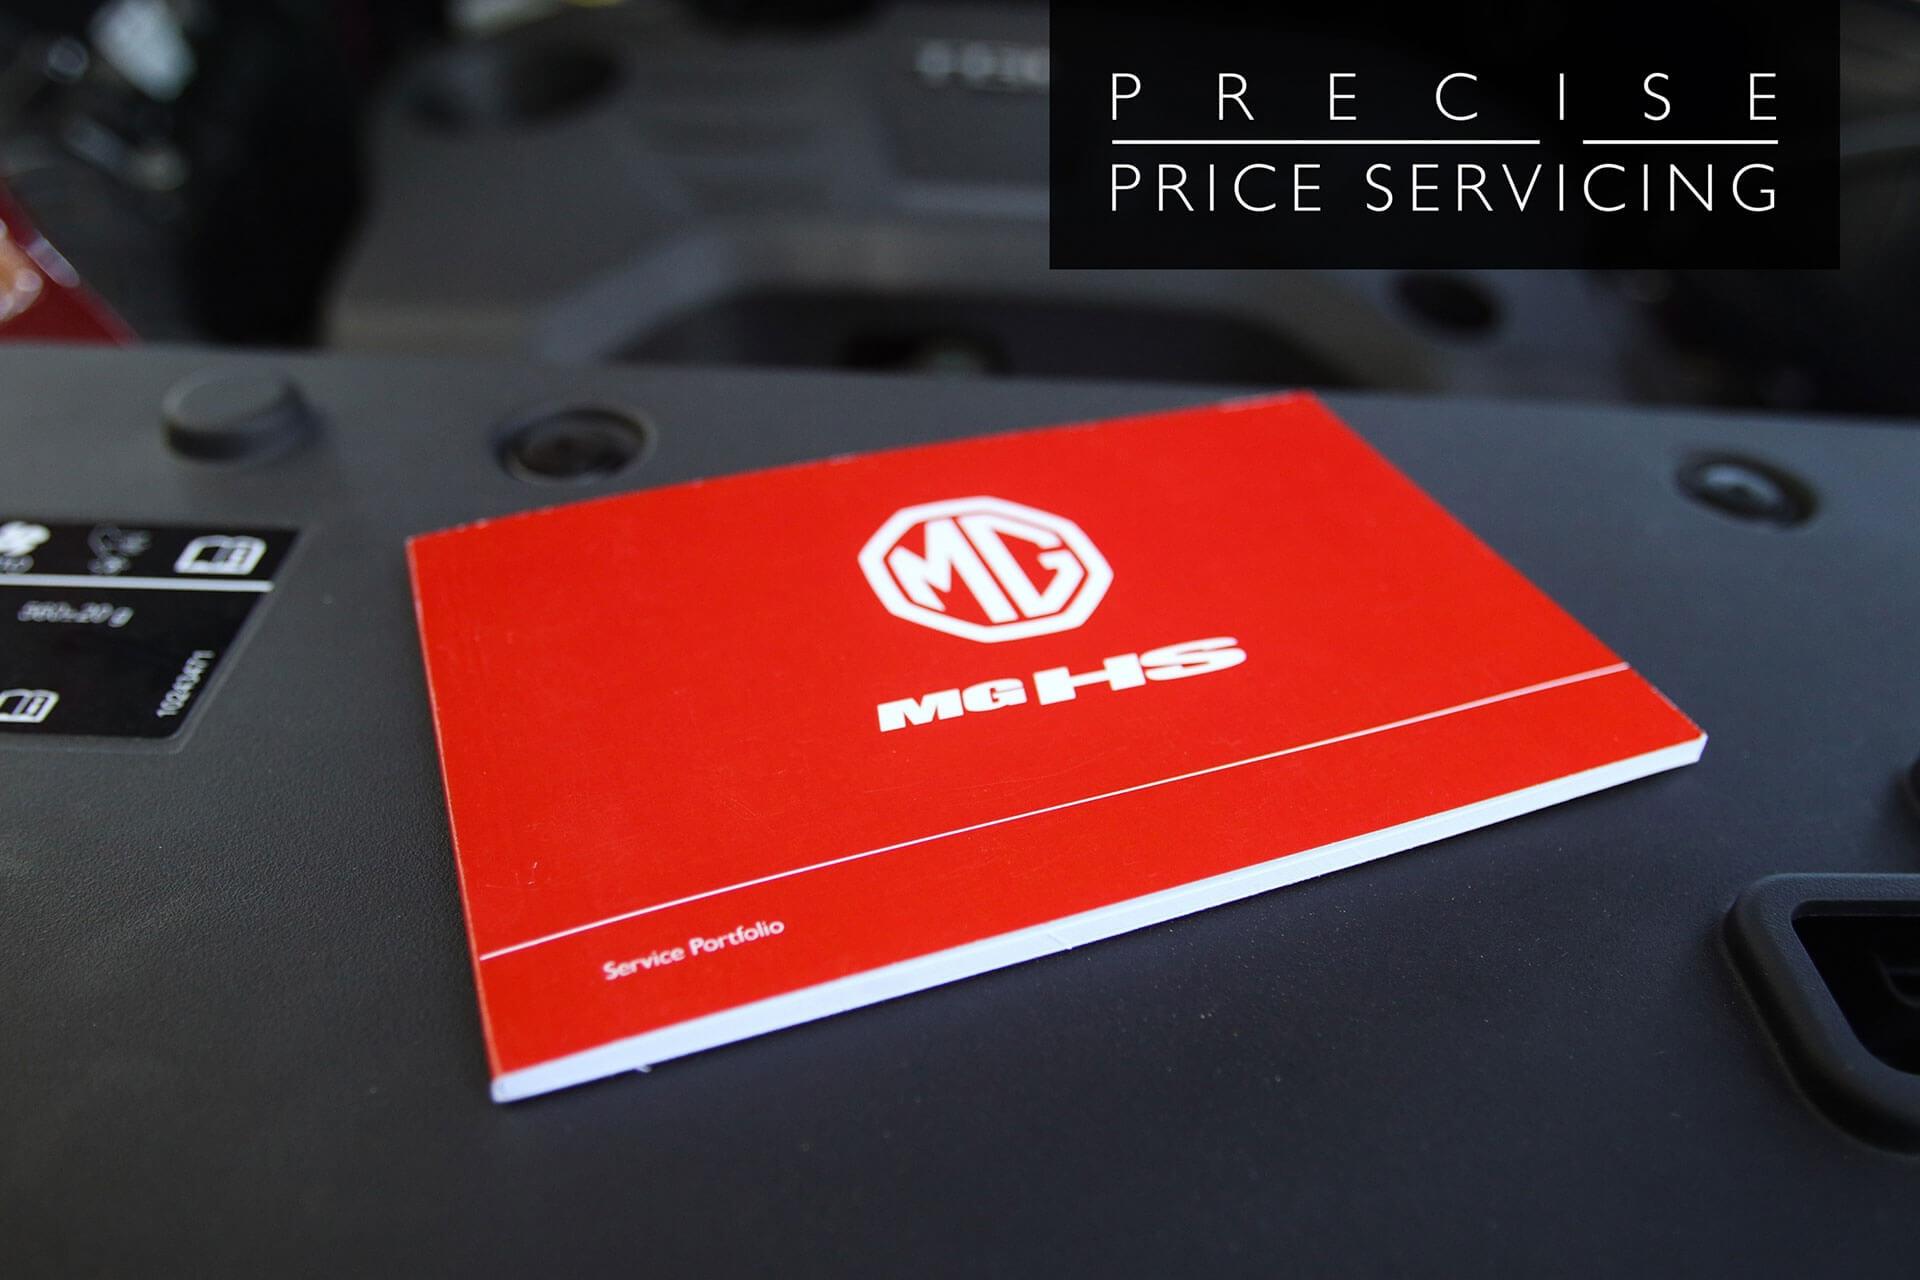 MG Motors Precise Price Servicing